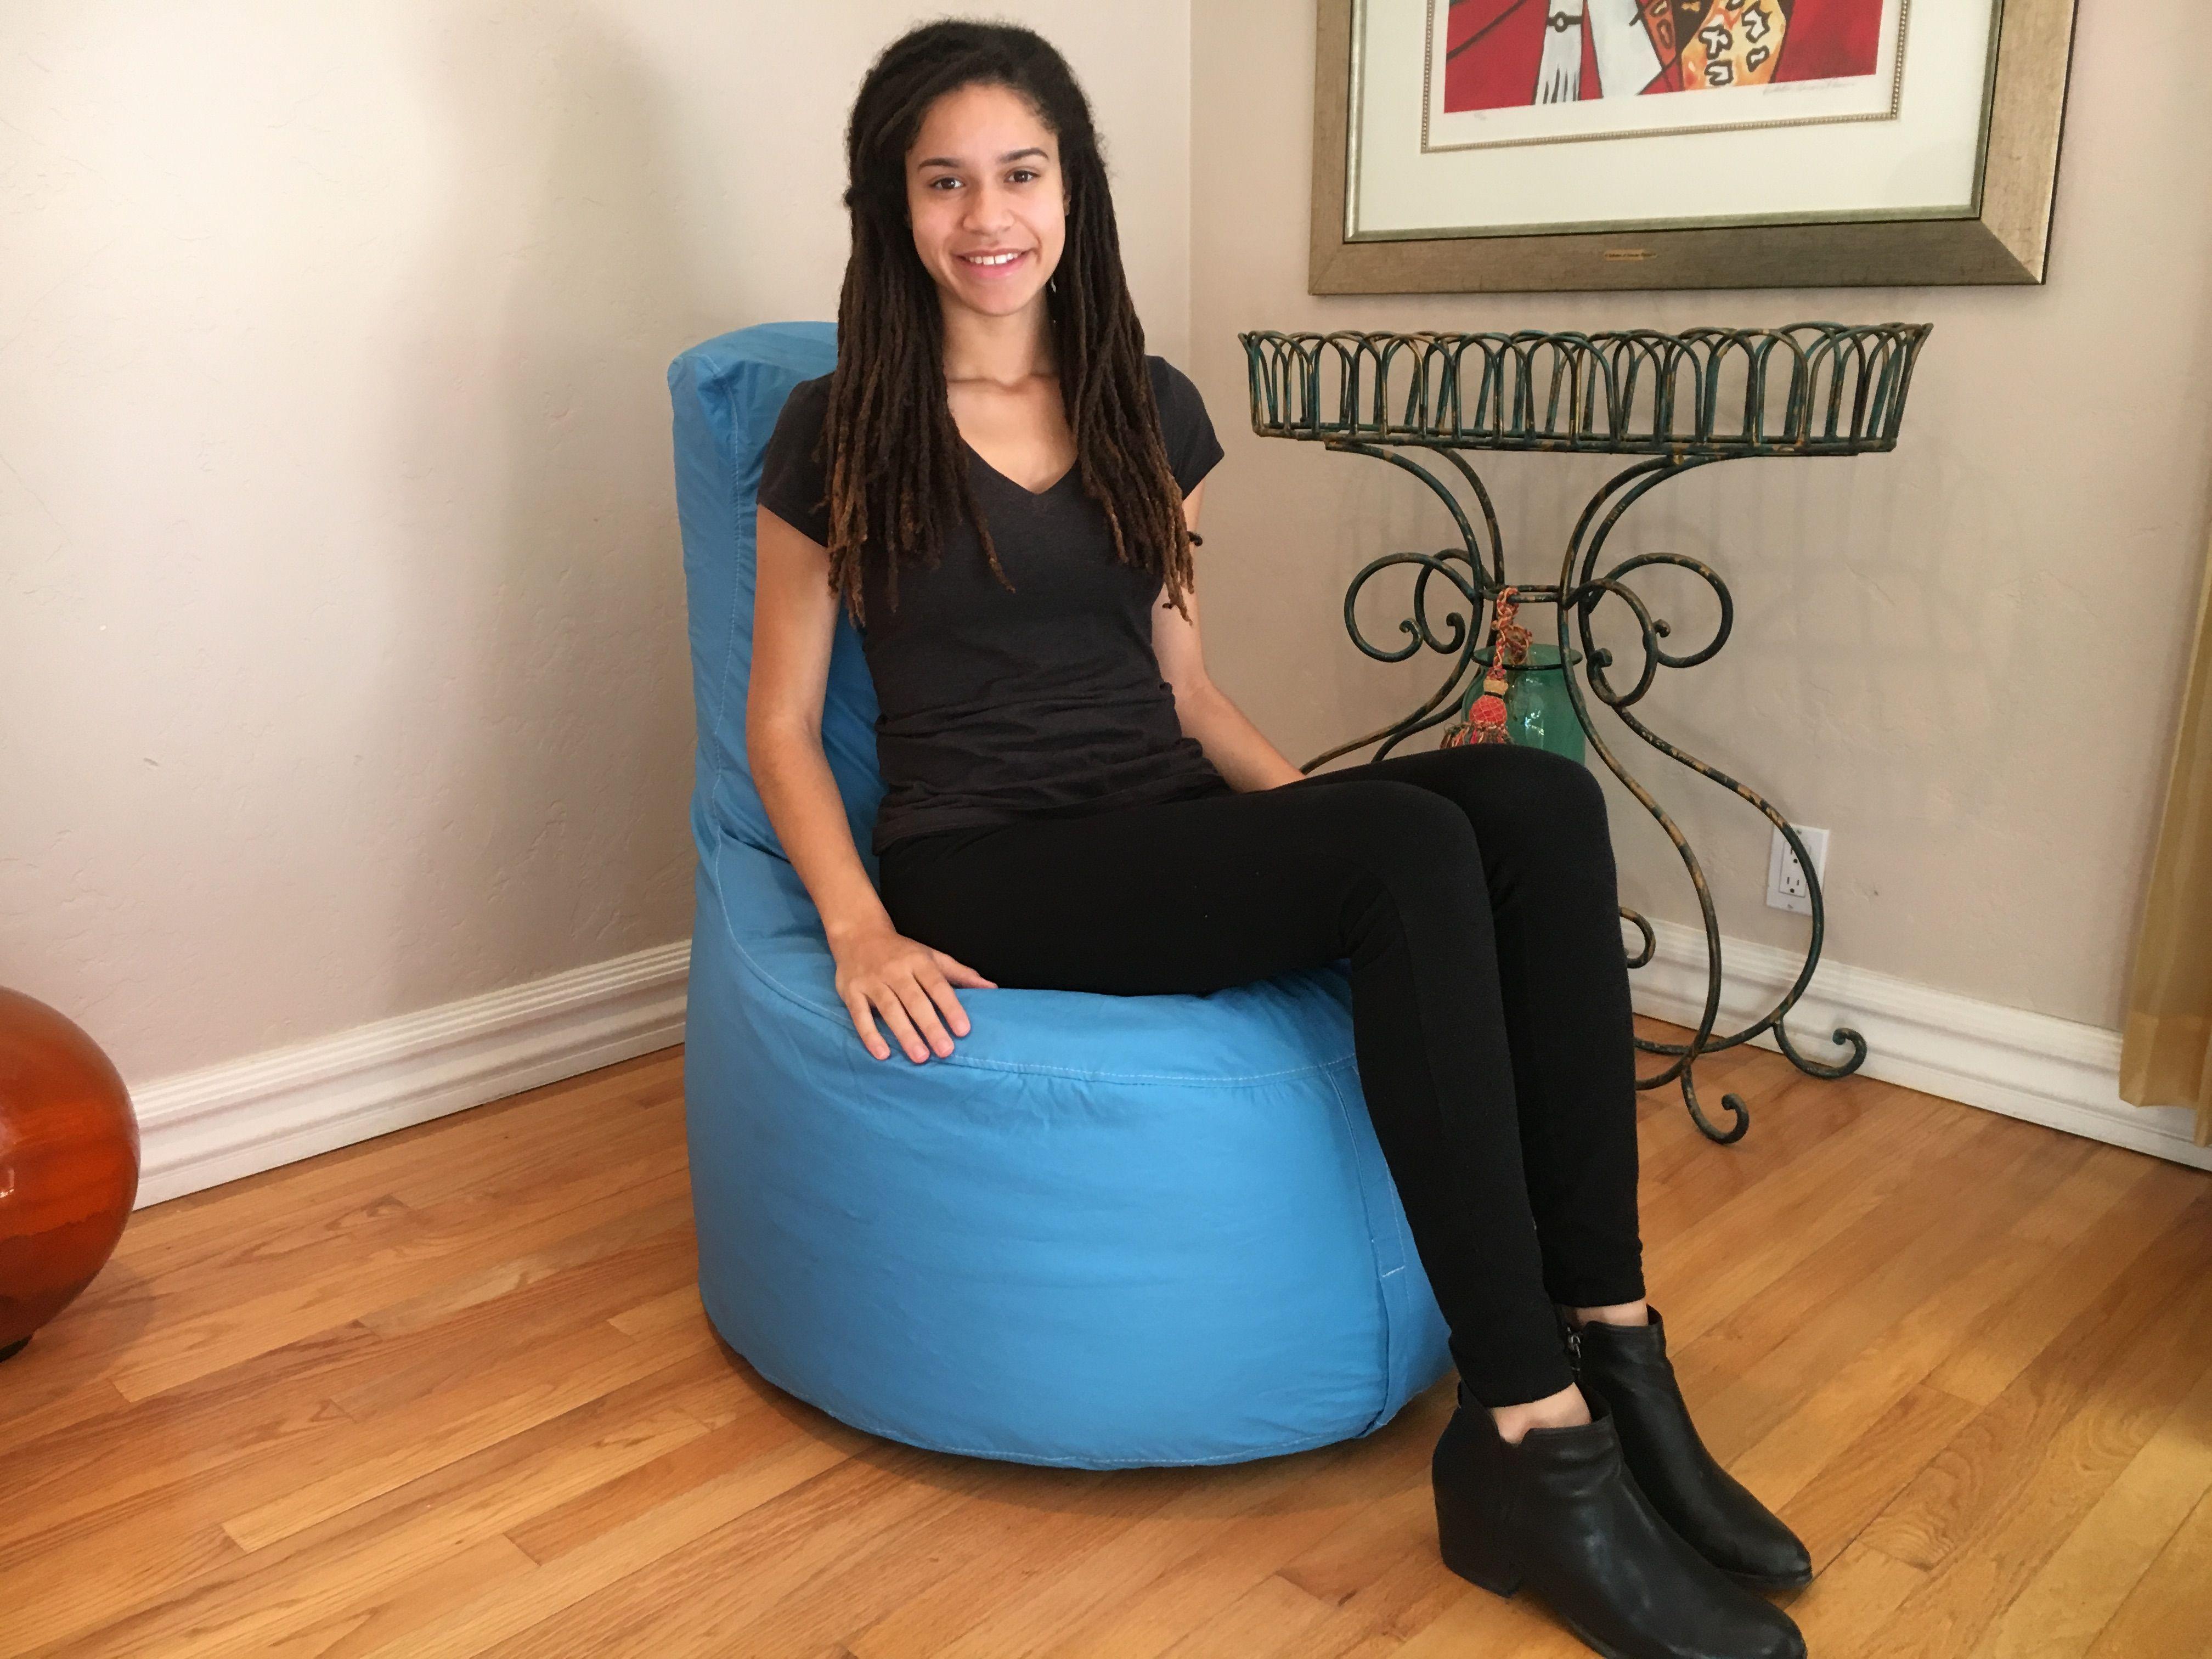 Sensational Adult Tech Leather Bean Bag Chair In Sky Blue Hip Chik Frankydiablos Diy Chair Ideas Frankydiabloscom